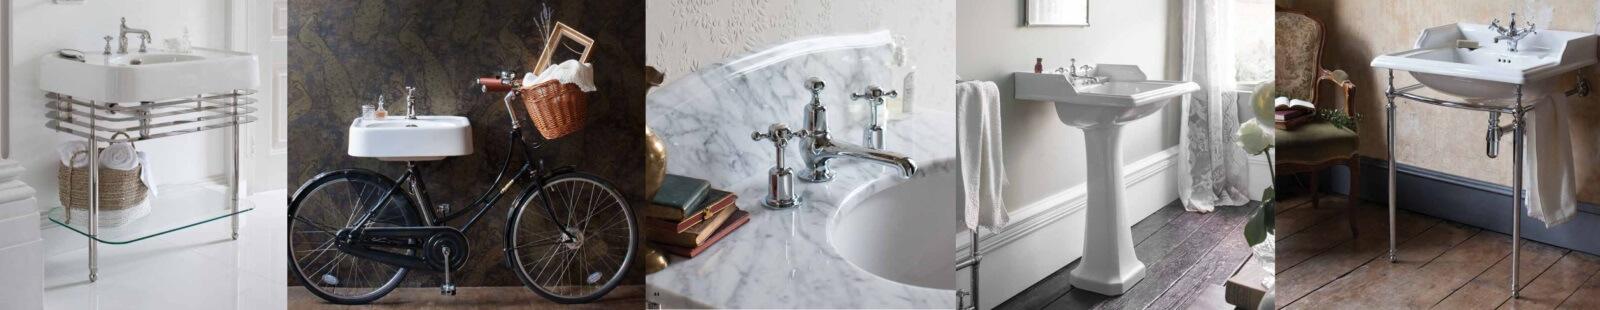 aquatop-js-lavabo-traditionnel